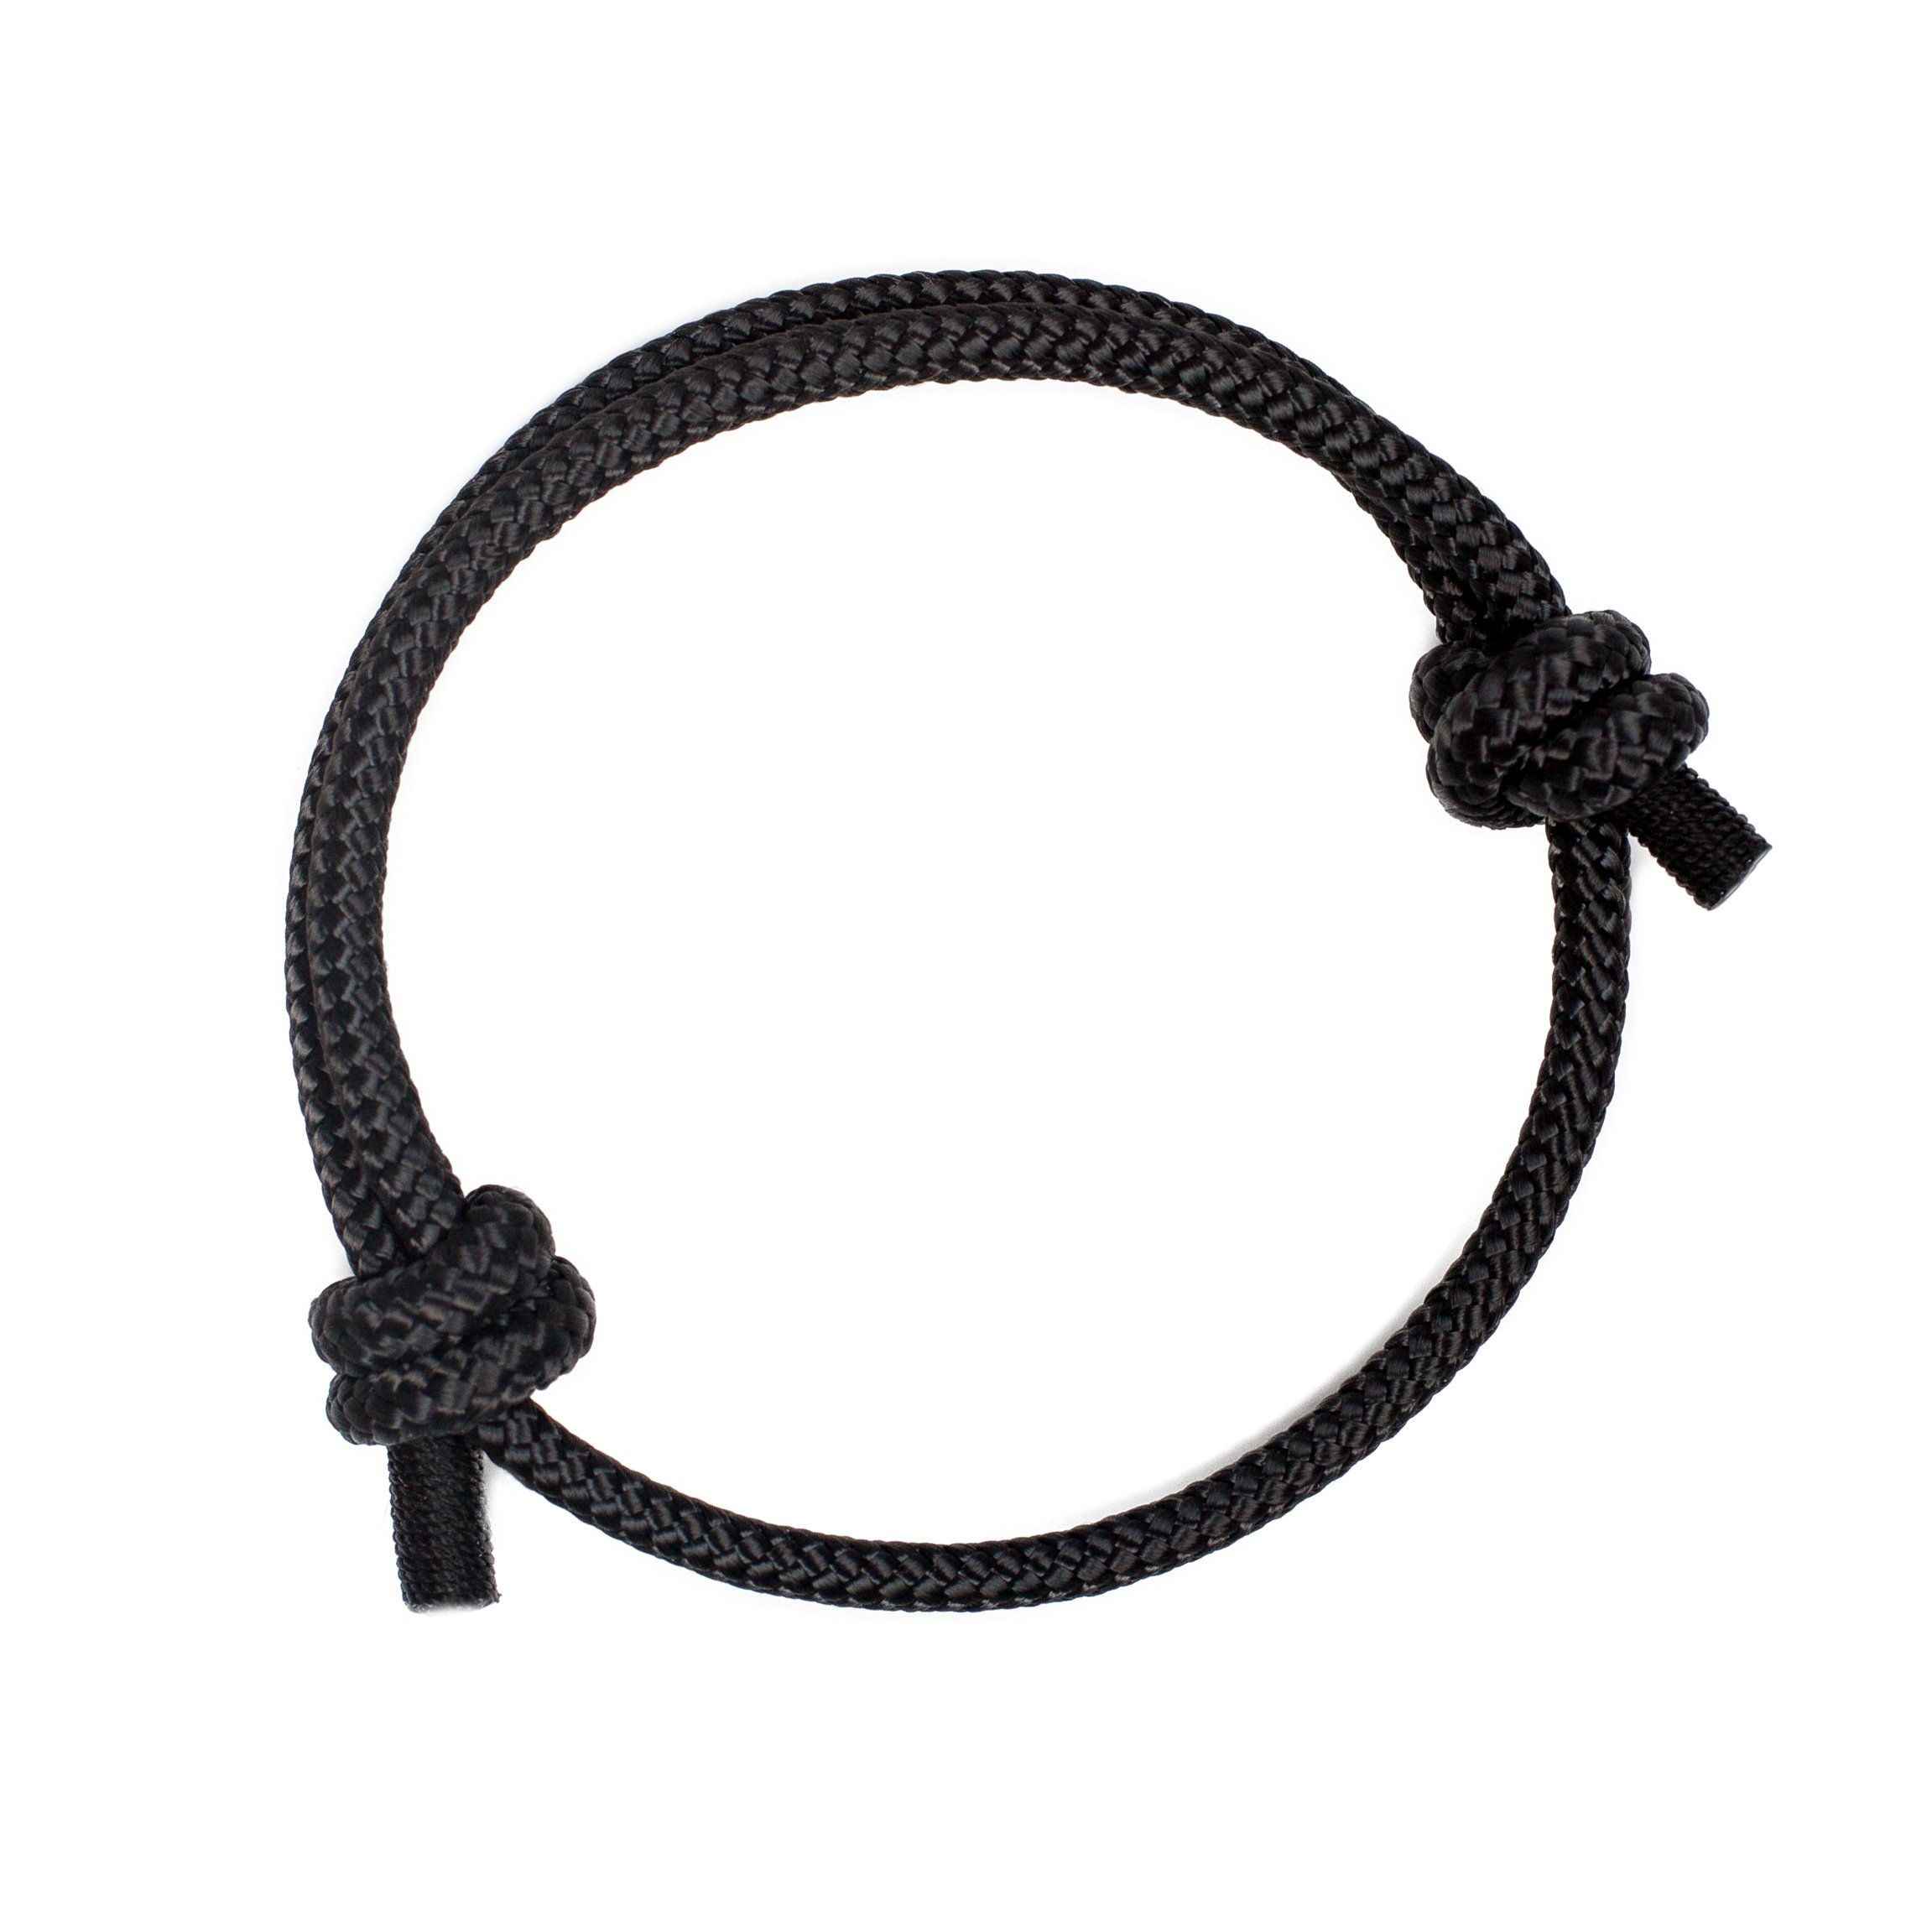 Wind Passion Black Braided Bracelet for Stylish Men